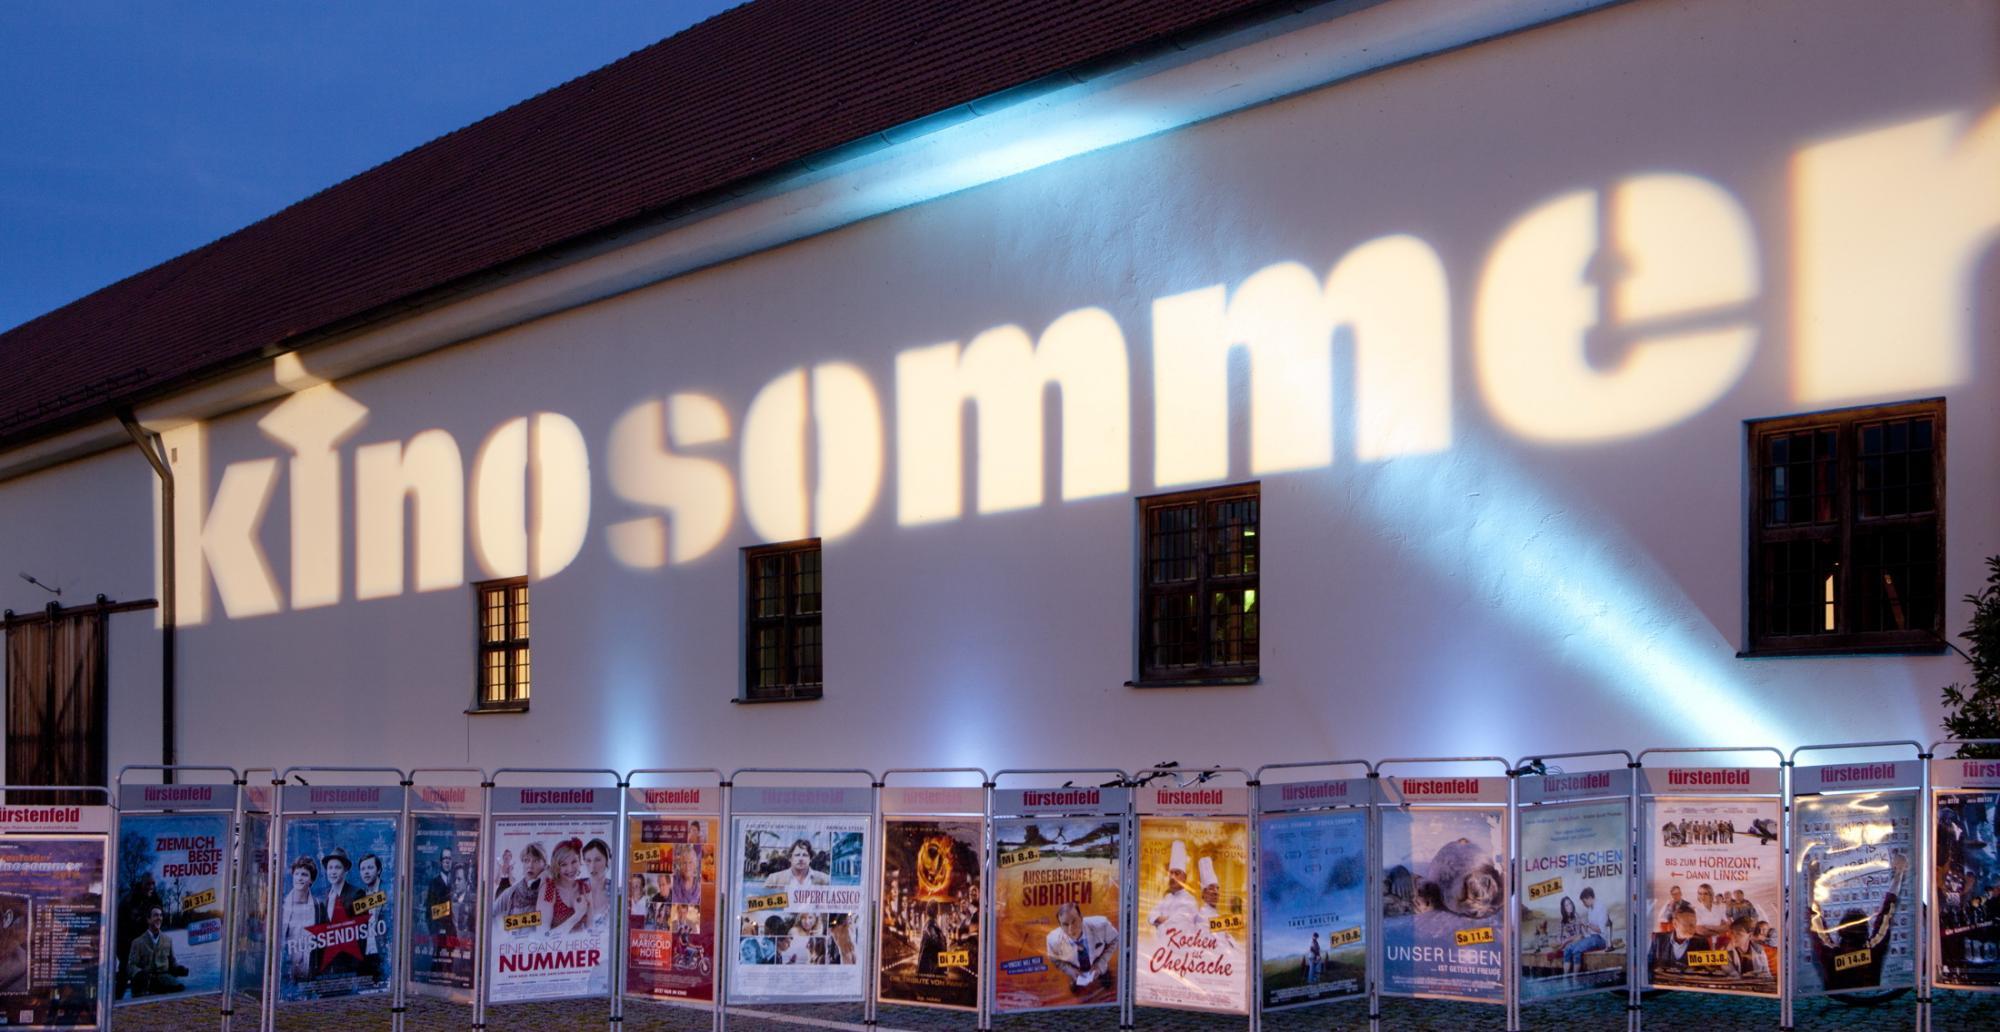 Fürstenfelder Kinosommer